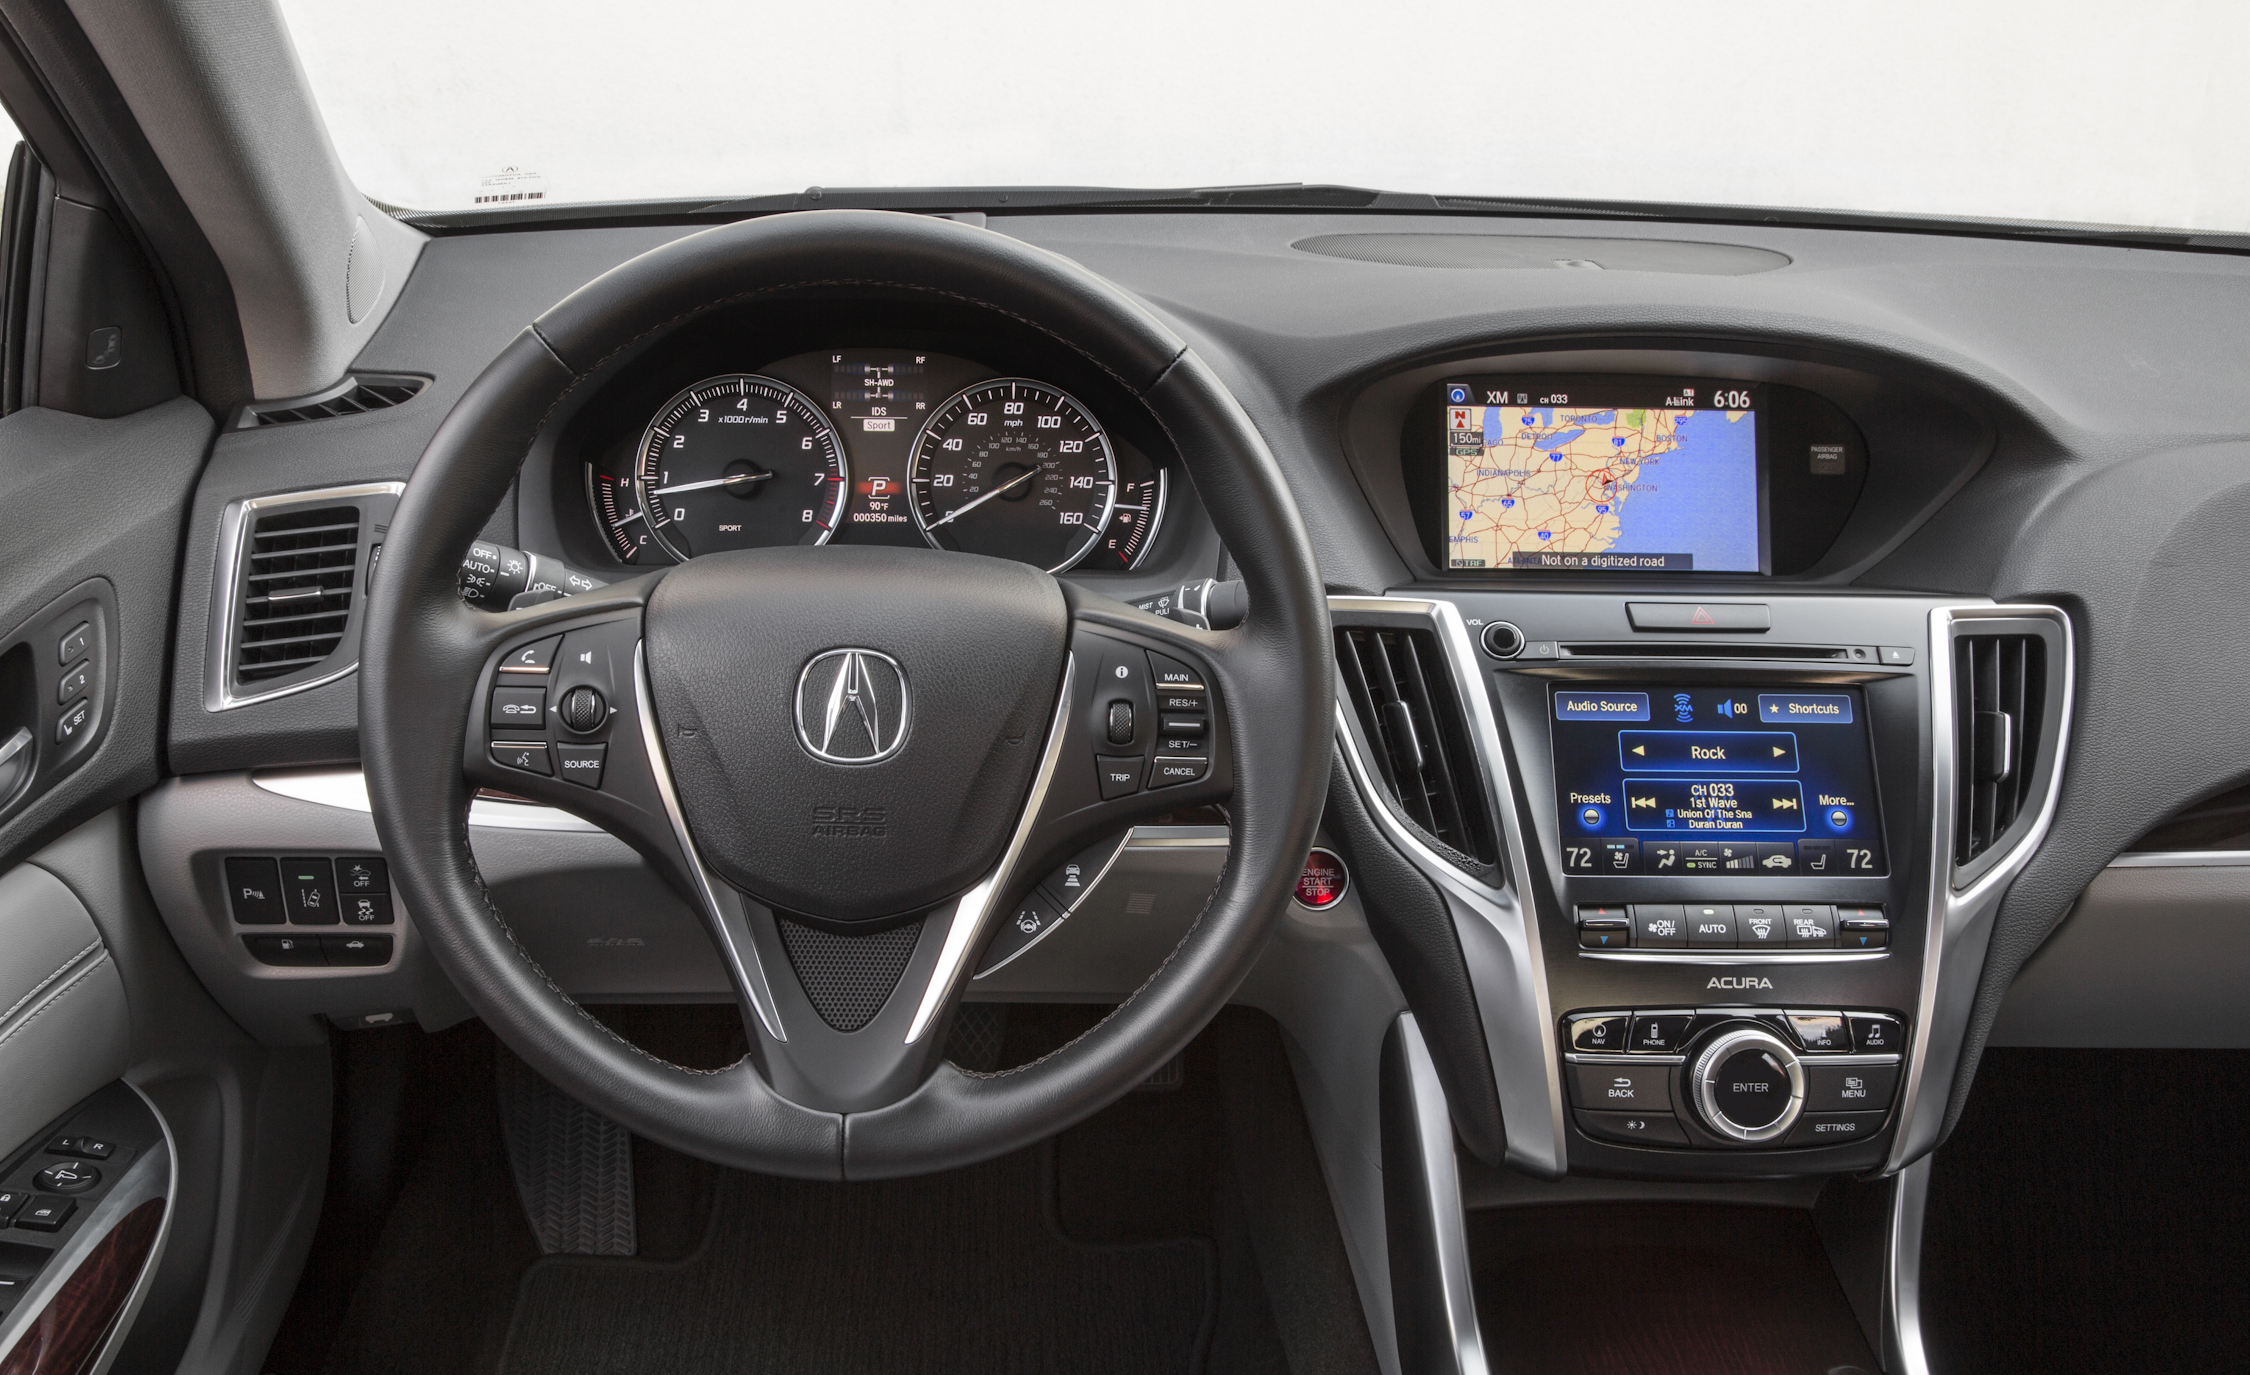 2015 Acura TLX 3.5L SH-AWD Interior Steering